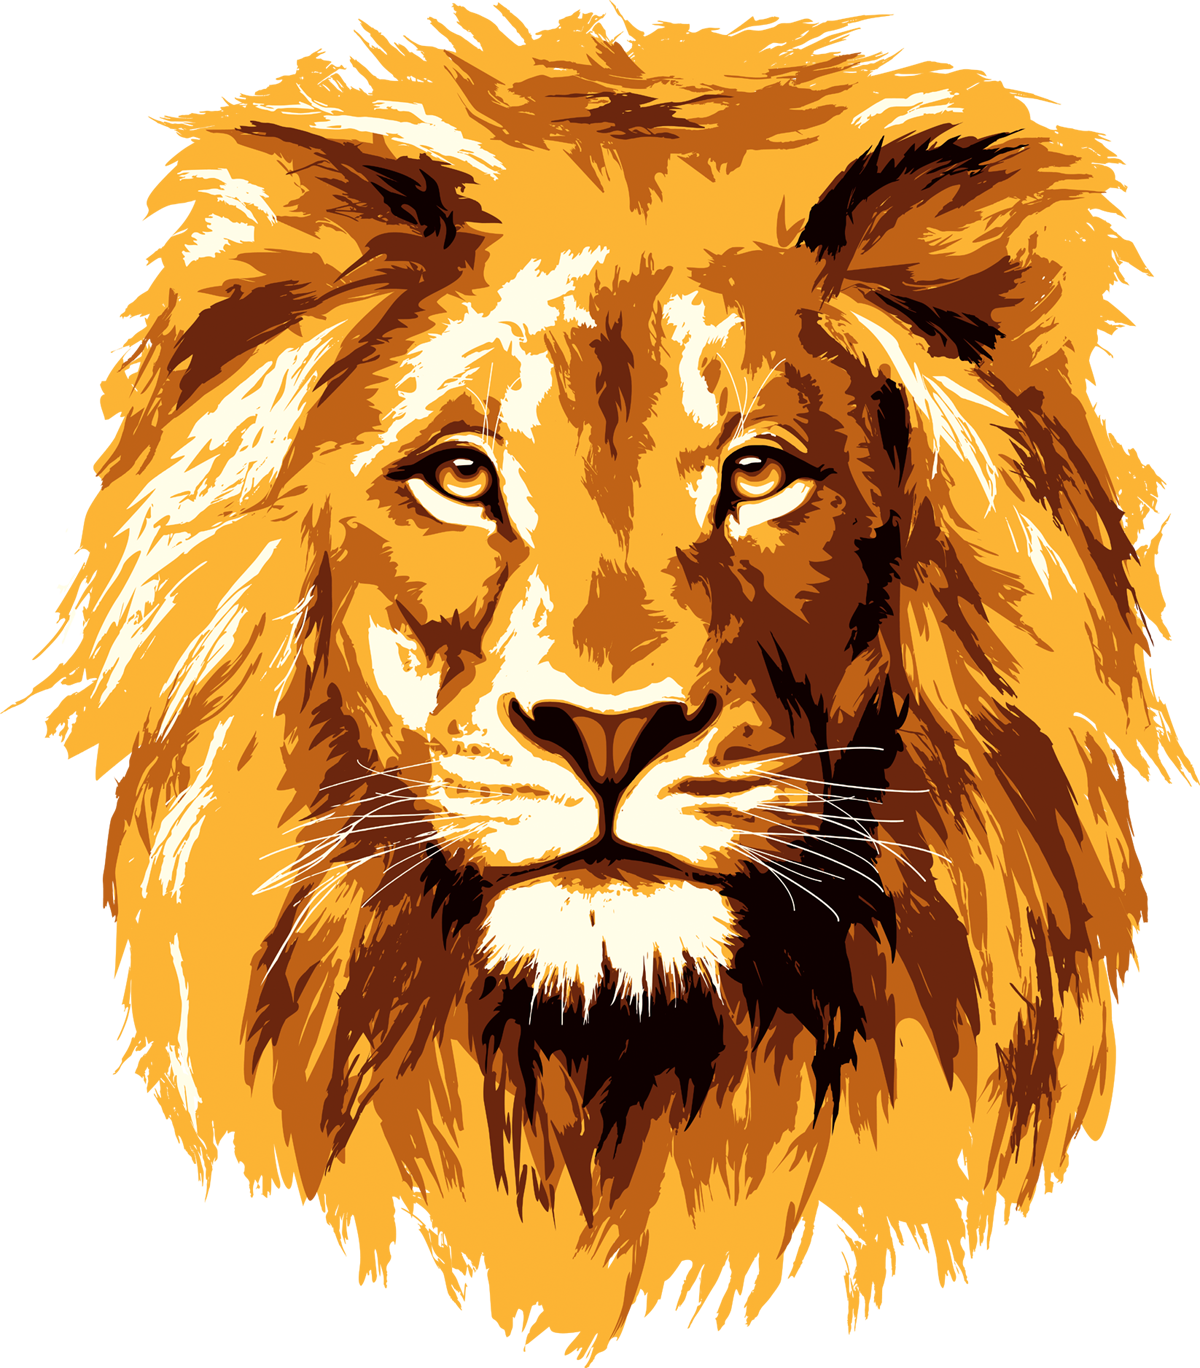 Golden lion face vector, Image Size: 1200 x 1368, Image Size : 1522 KB - Lion And Den PNG